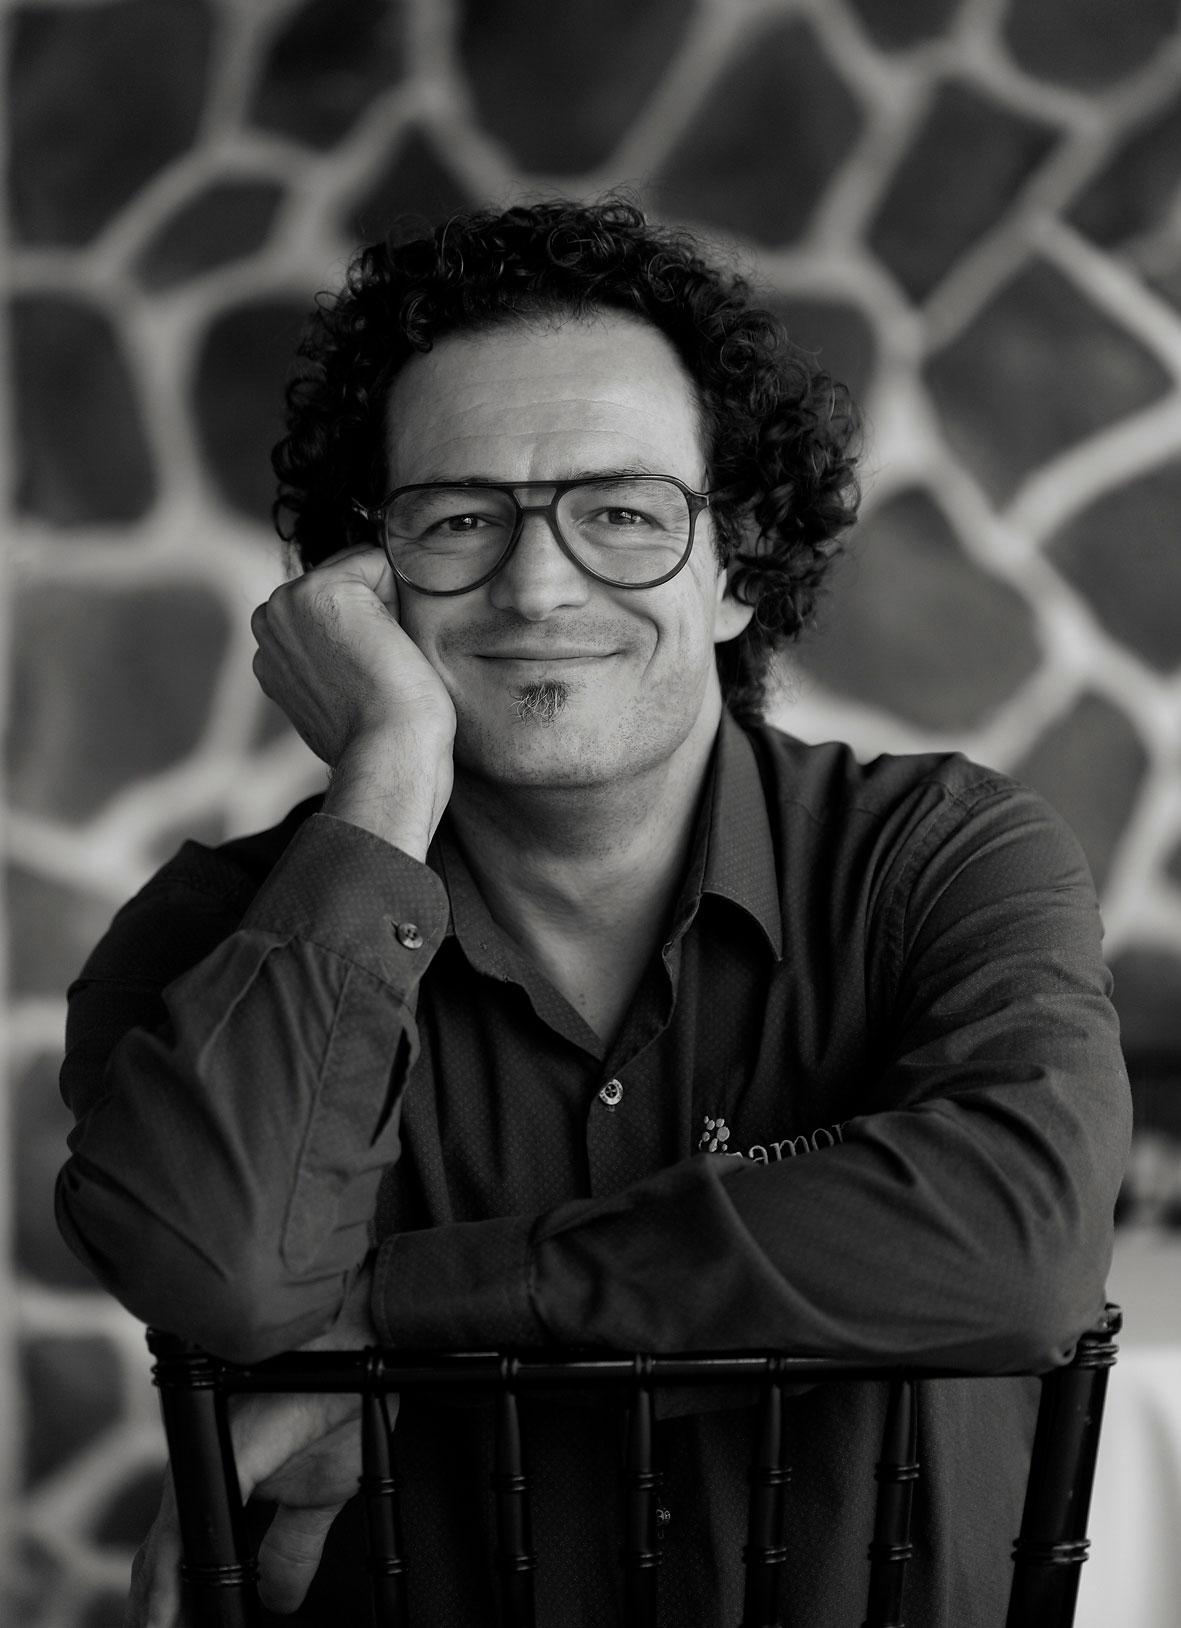 Carlos Gamonal © Jordi Verdés Padrón